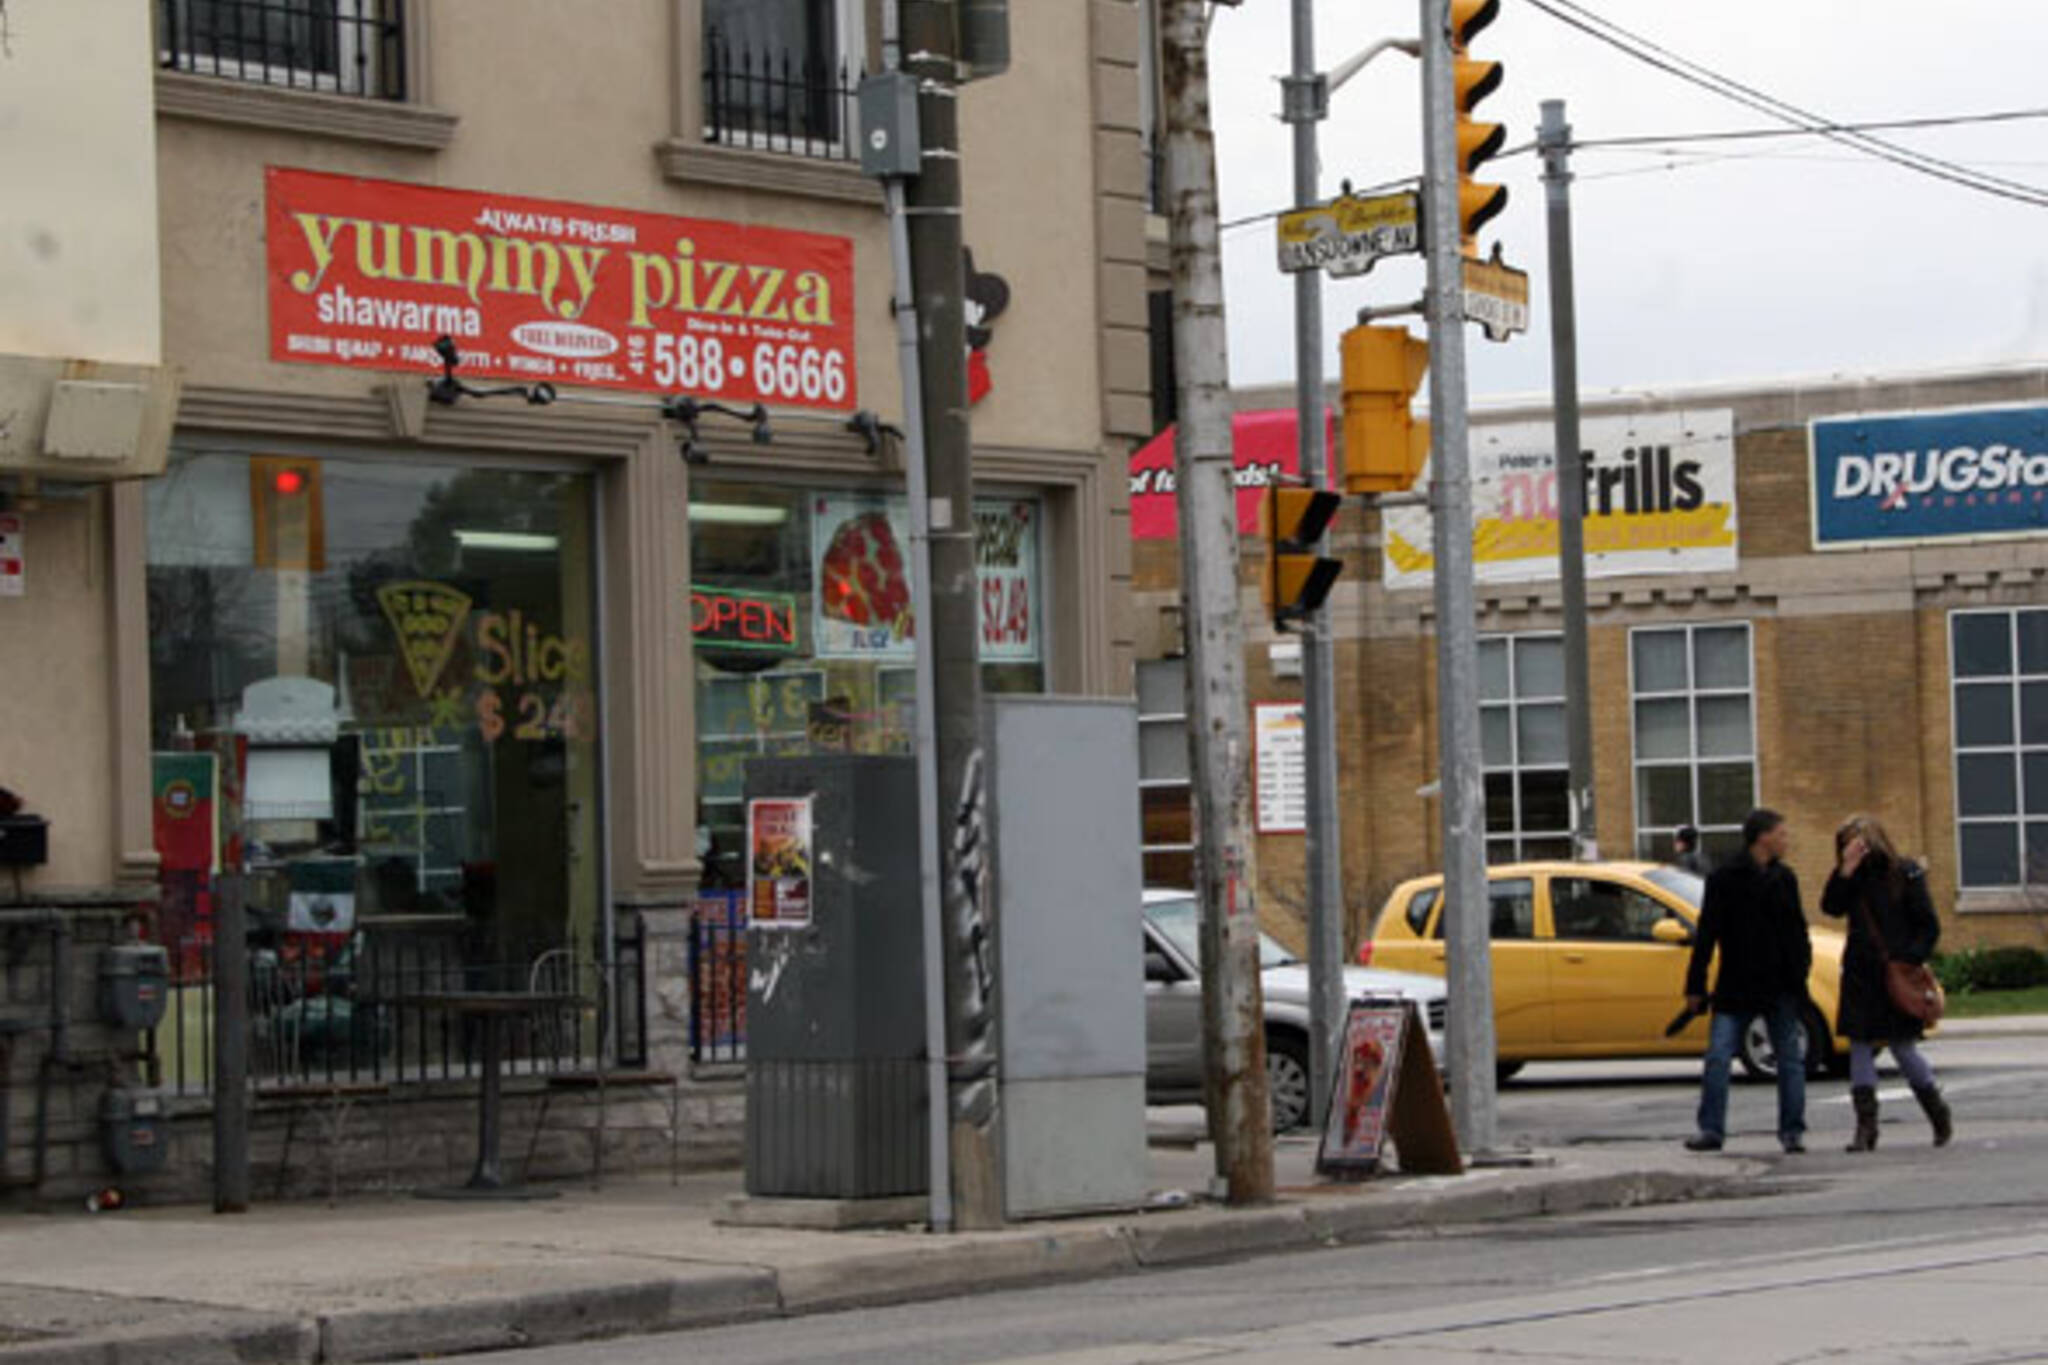 Yummy Pizza Toronto